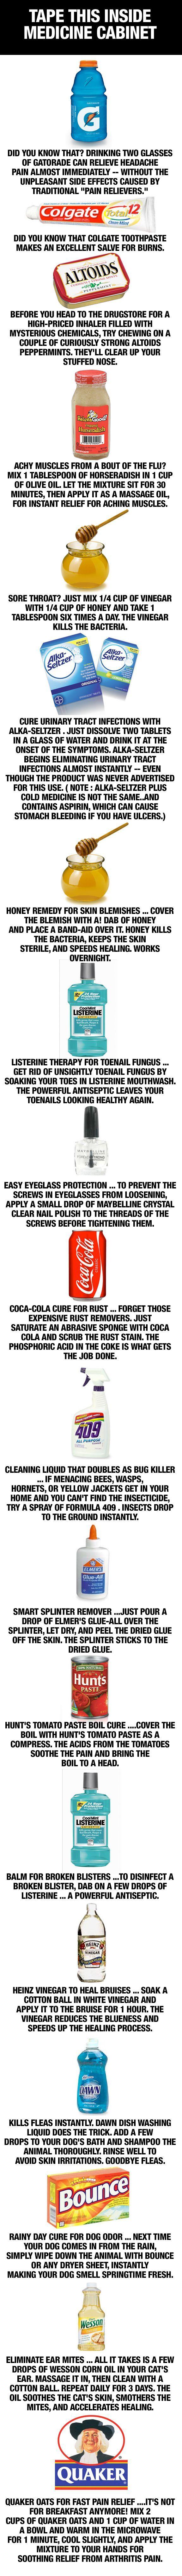 Alternative Uses for Household Items